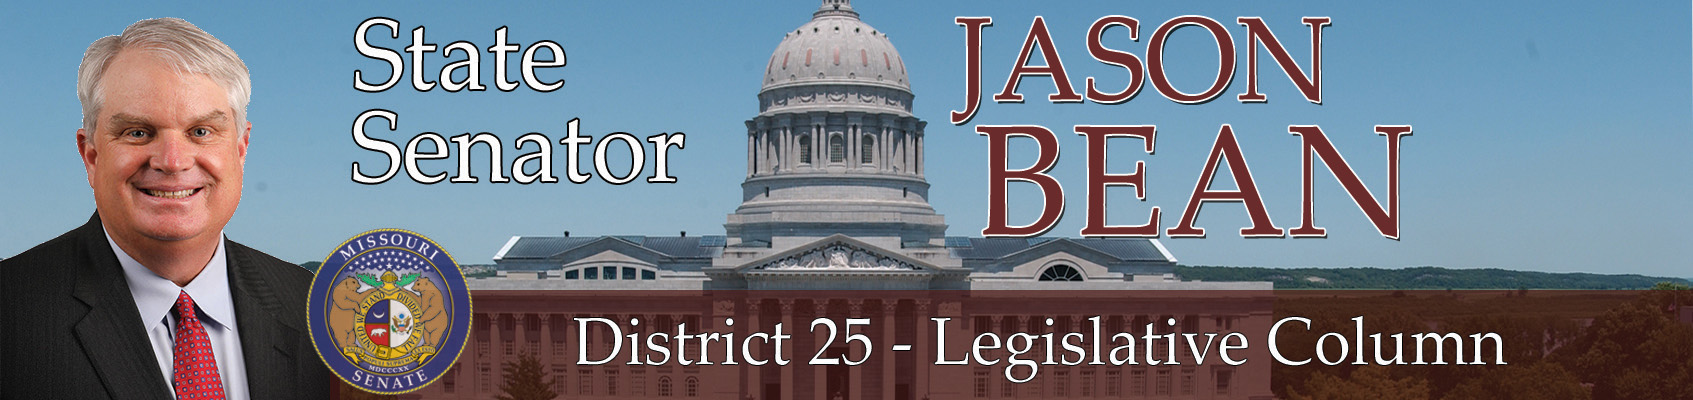 Sen. Jason Bean's Legislative Column for March 8, 2021 – Missouri Senate